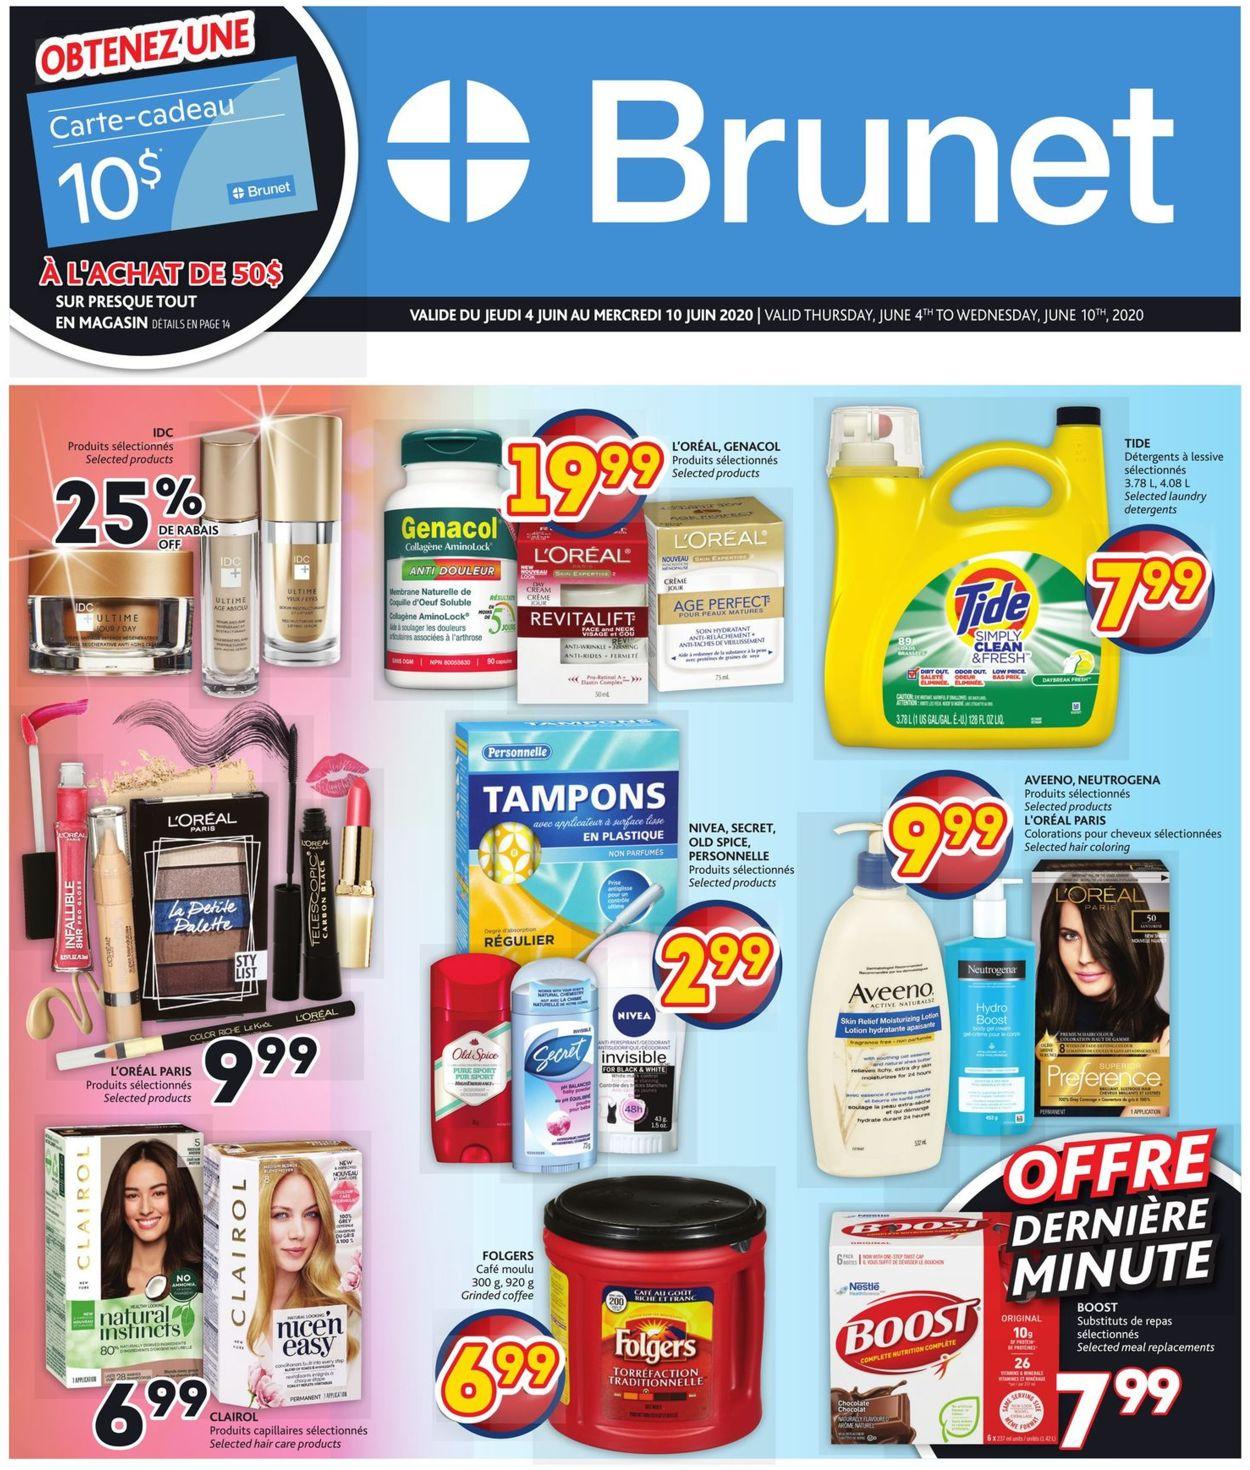 Brunet Flyer - 06/04-06/10/2020